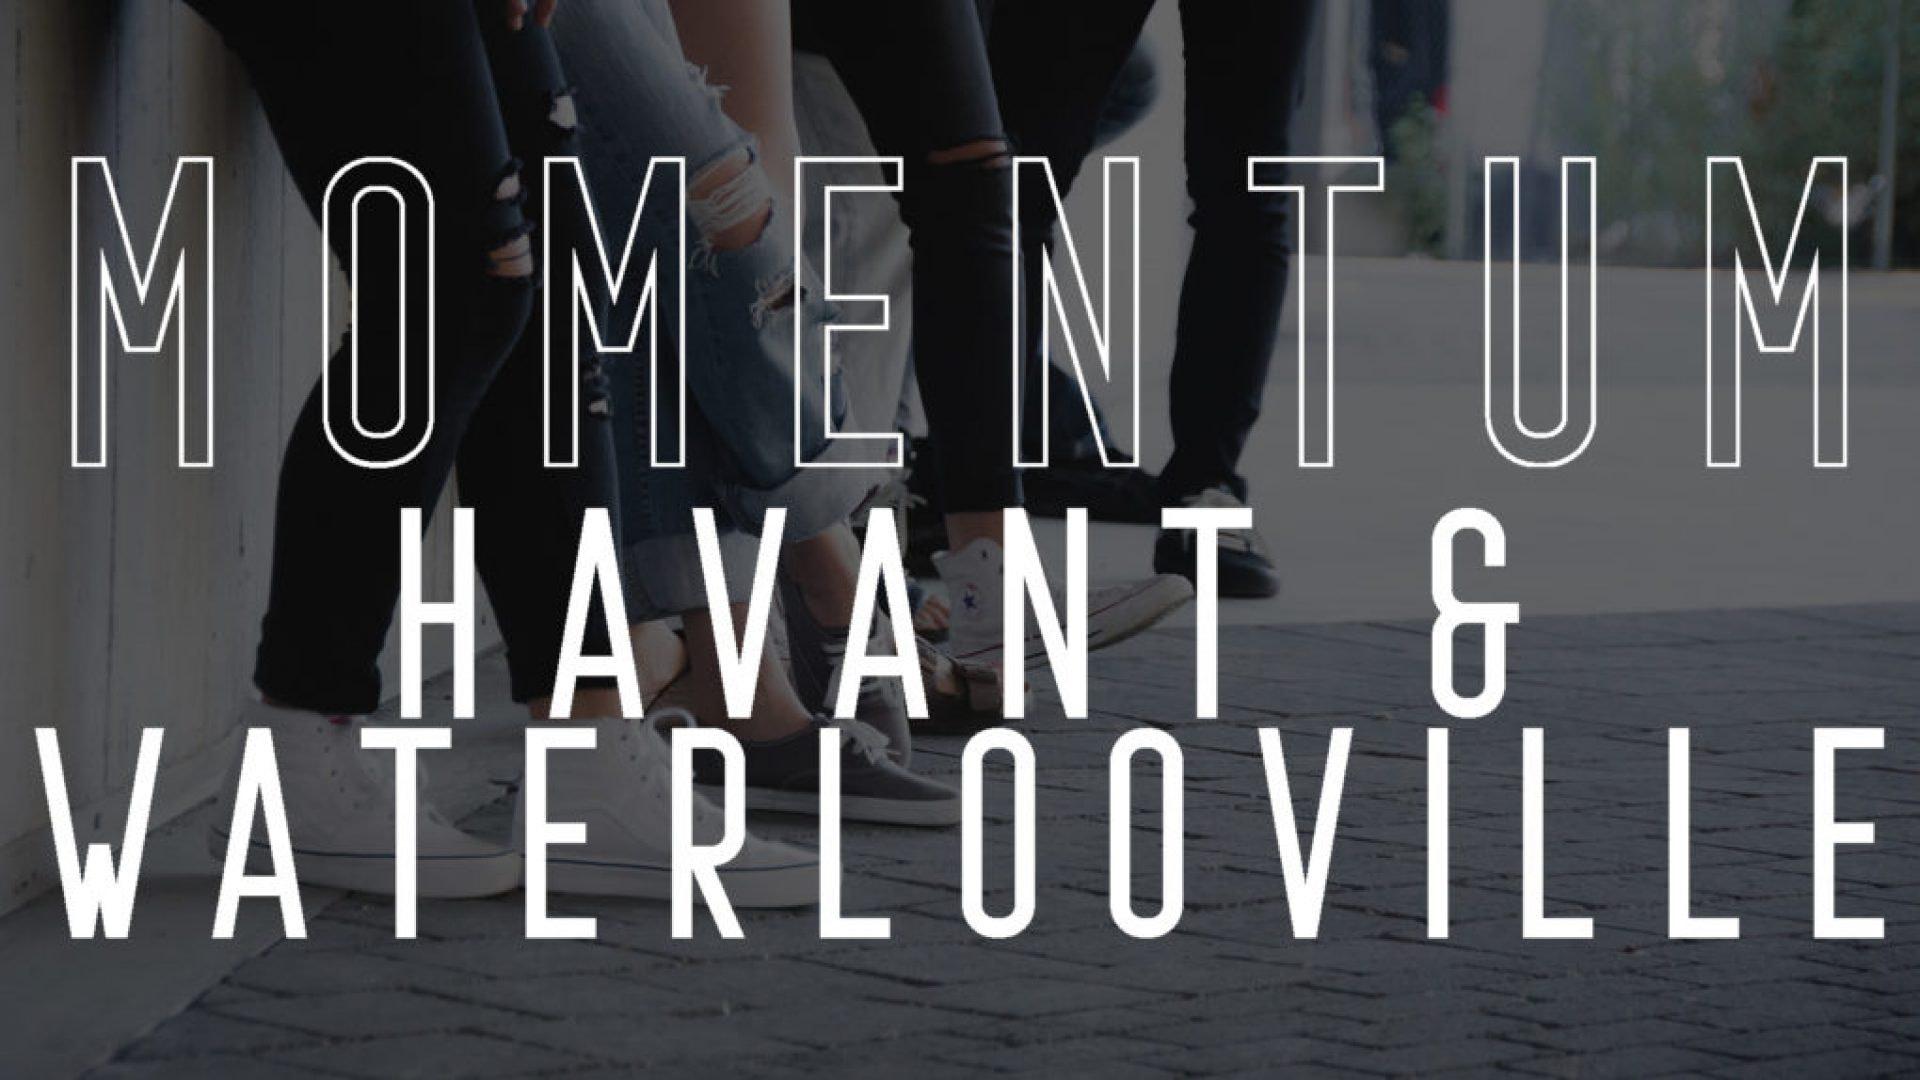 Momentum HVNT_WTLV Groups Image_PCO